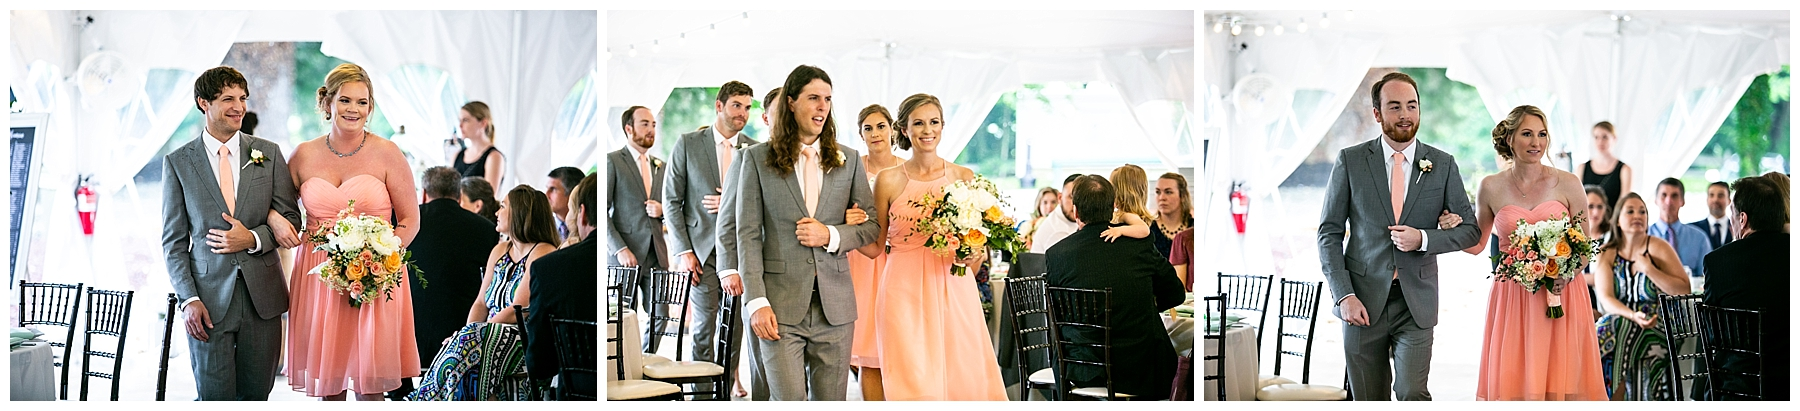 Chelsea Phil Bohemia River Overlook Wedding Living Radiant Photography photos_0102.jpg